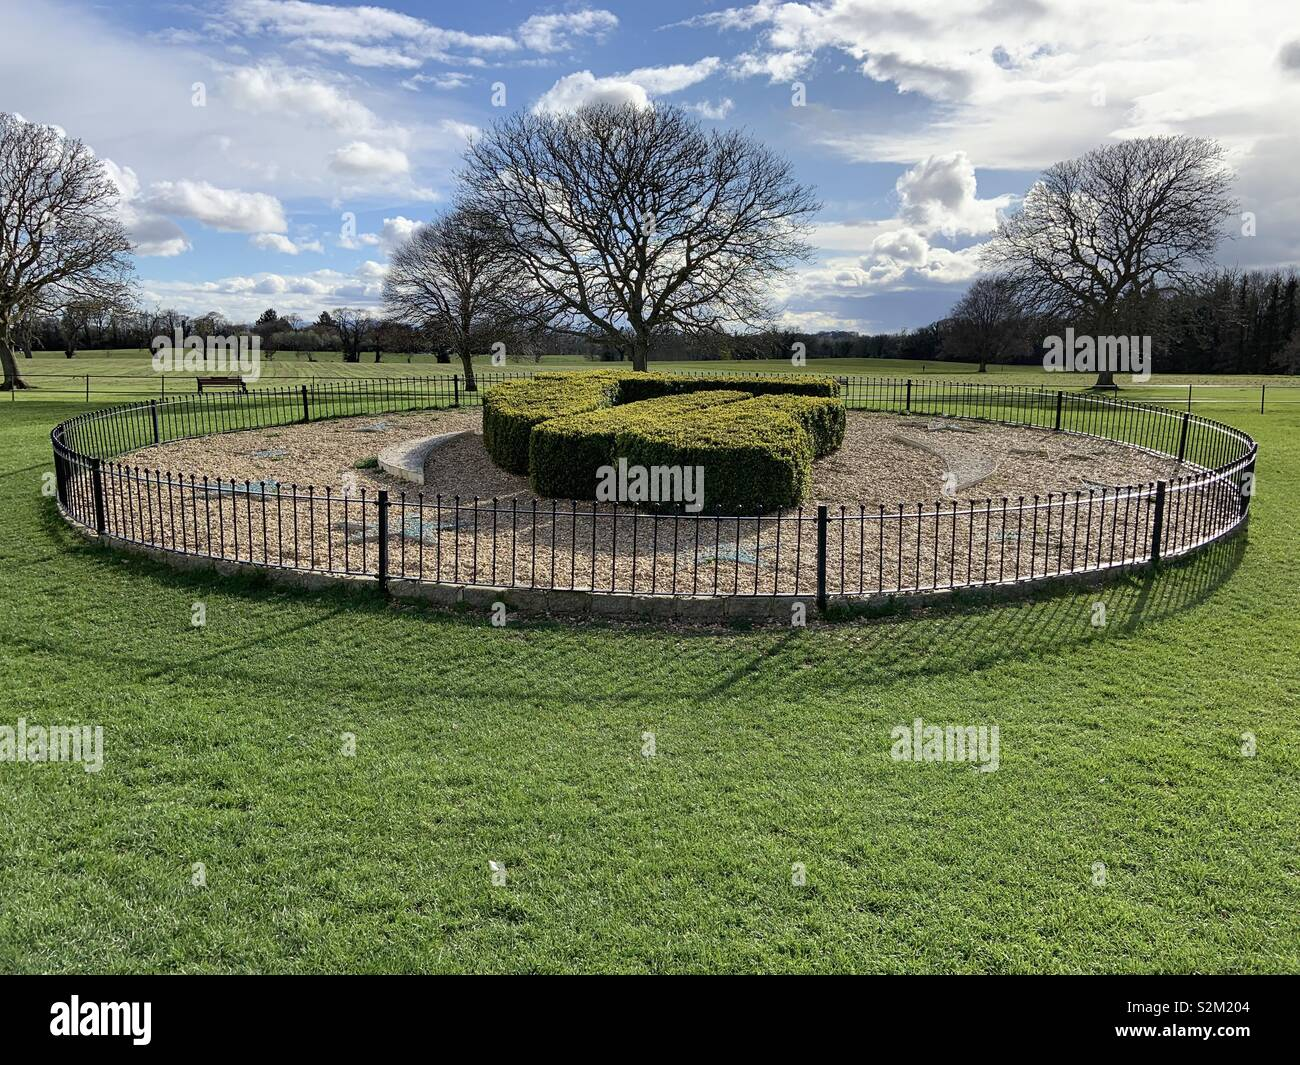 Malahide Castle & Gardens, Malahide, Dublin, Ireland. - Stock Image